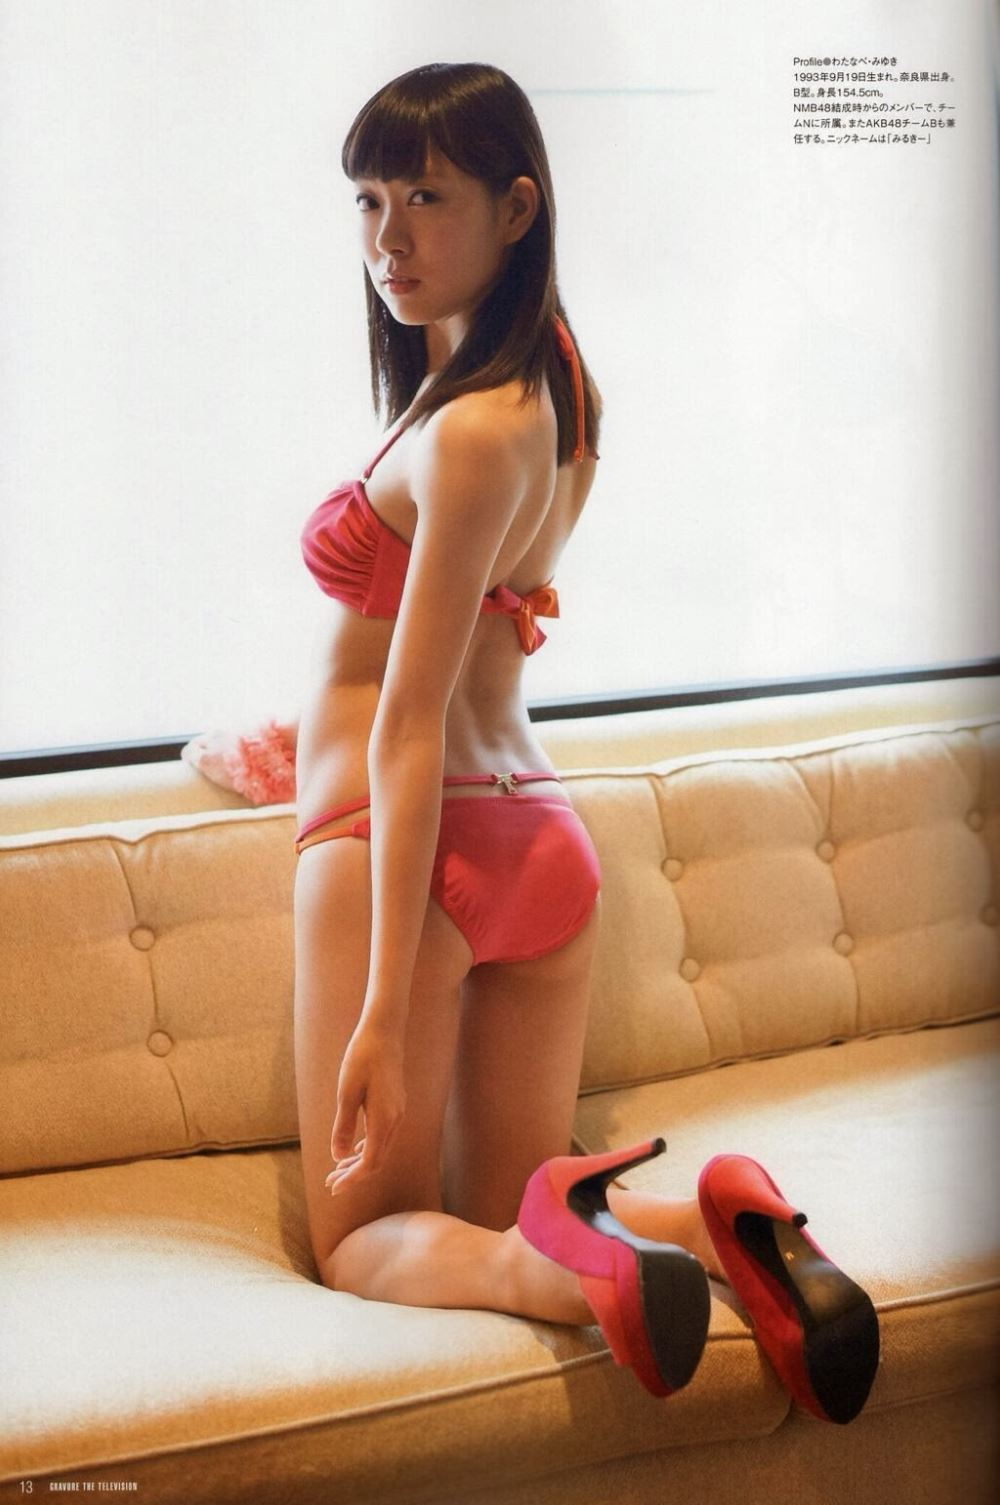 渡辺美優紀 エロ画像 28